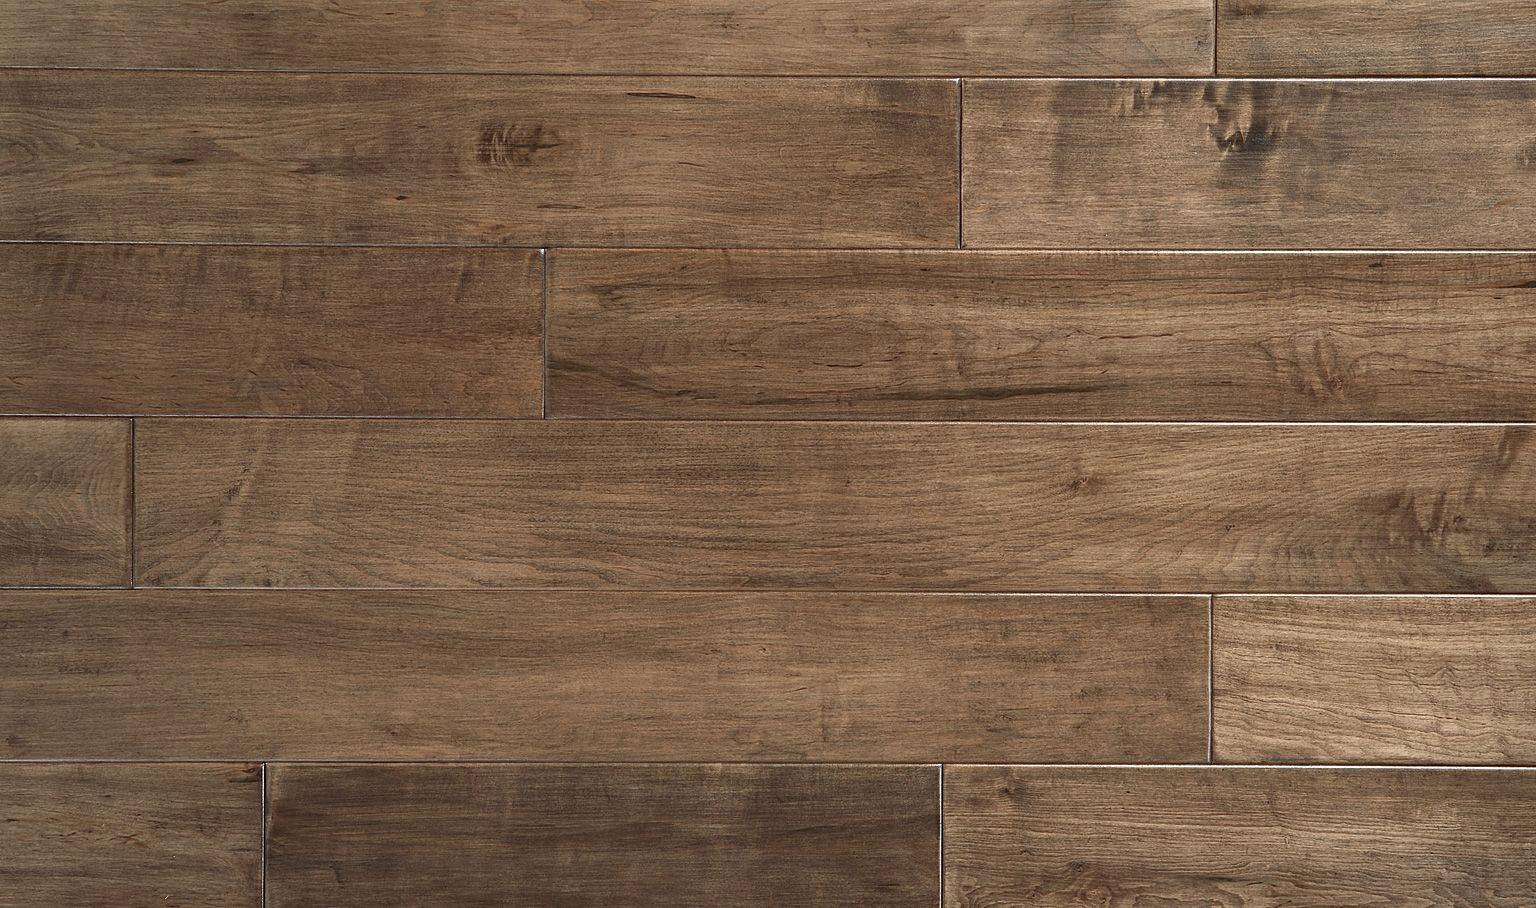 jasper prefinished oak hardwood flooring reviews of wlcu page 239 best home design ideas inside hardwood flooring long island luxury antique medium brown hardwood floors maple hardwood flooring